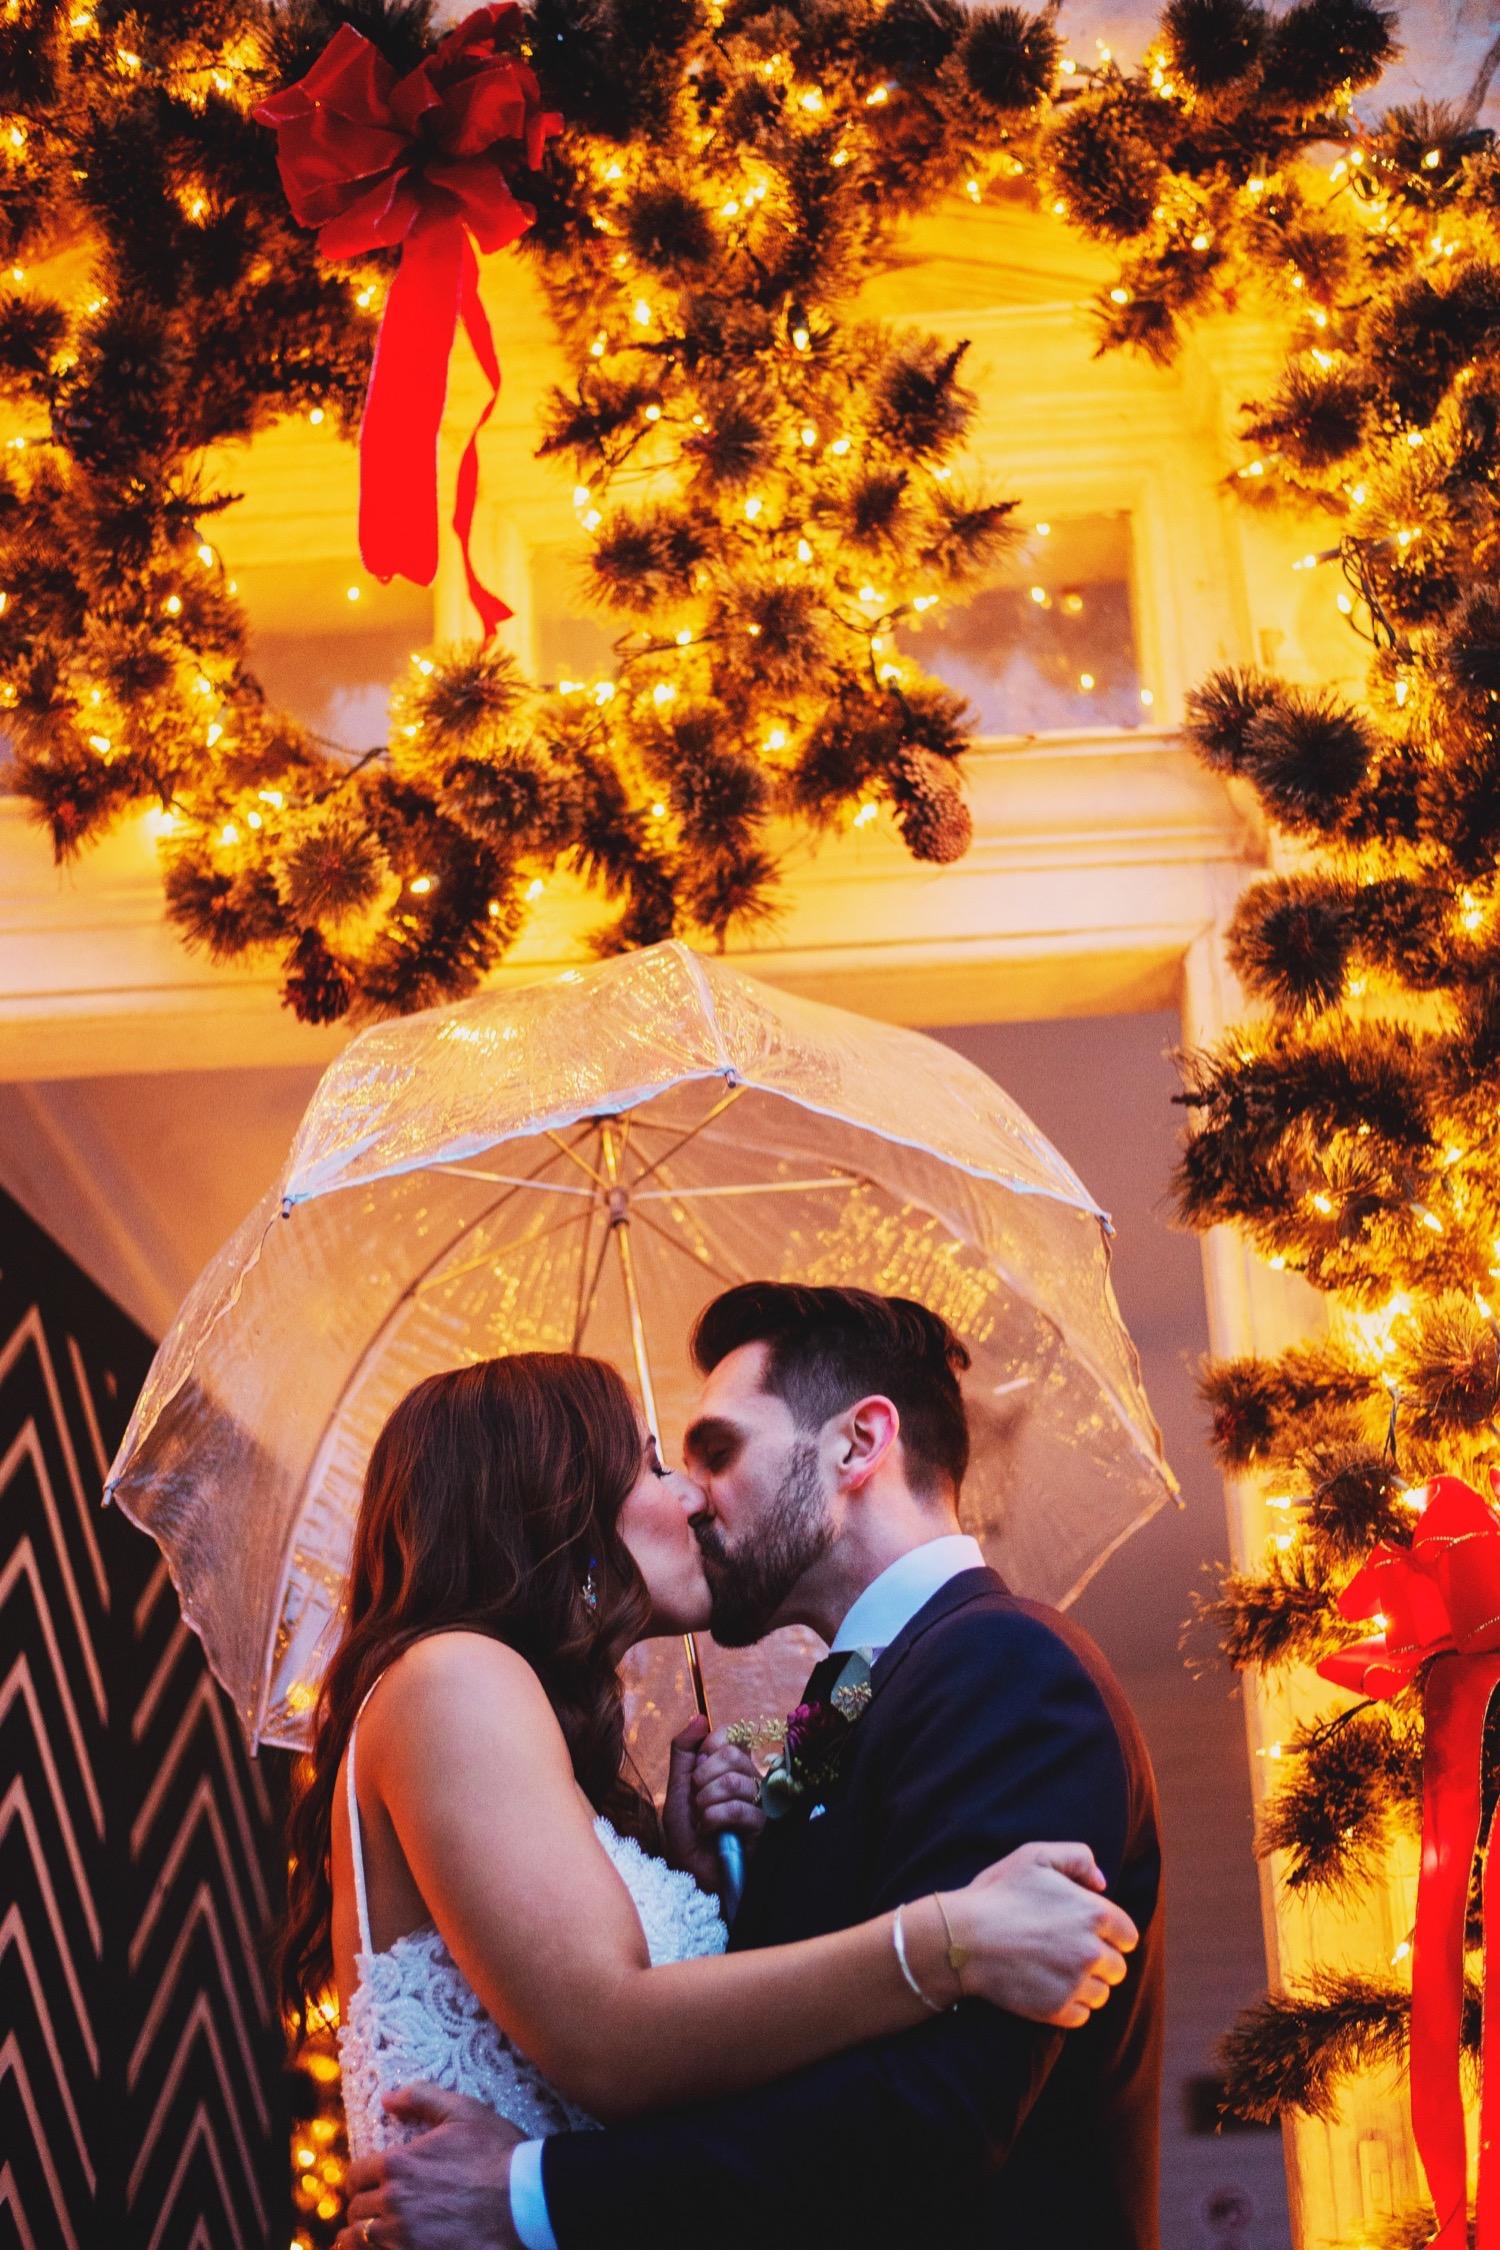 075_Haavig_Danada-Christmas-December-Wedding_0139_ChristmasWedding_Decemberwedding_DanadaHouse_ChicagoSuburbWedding_Chicagowedding_Wedding.jpg